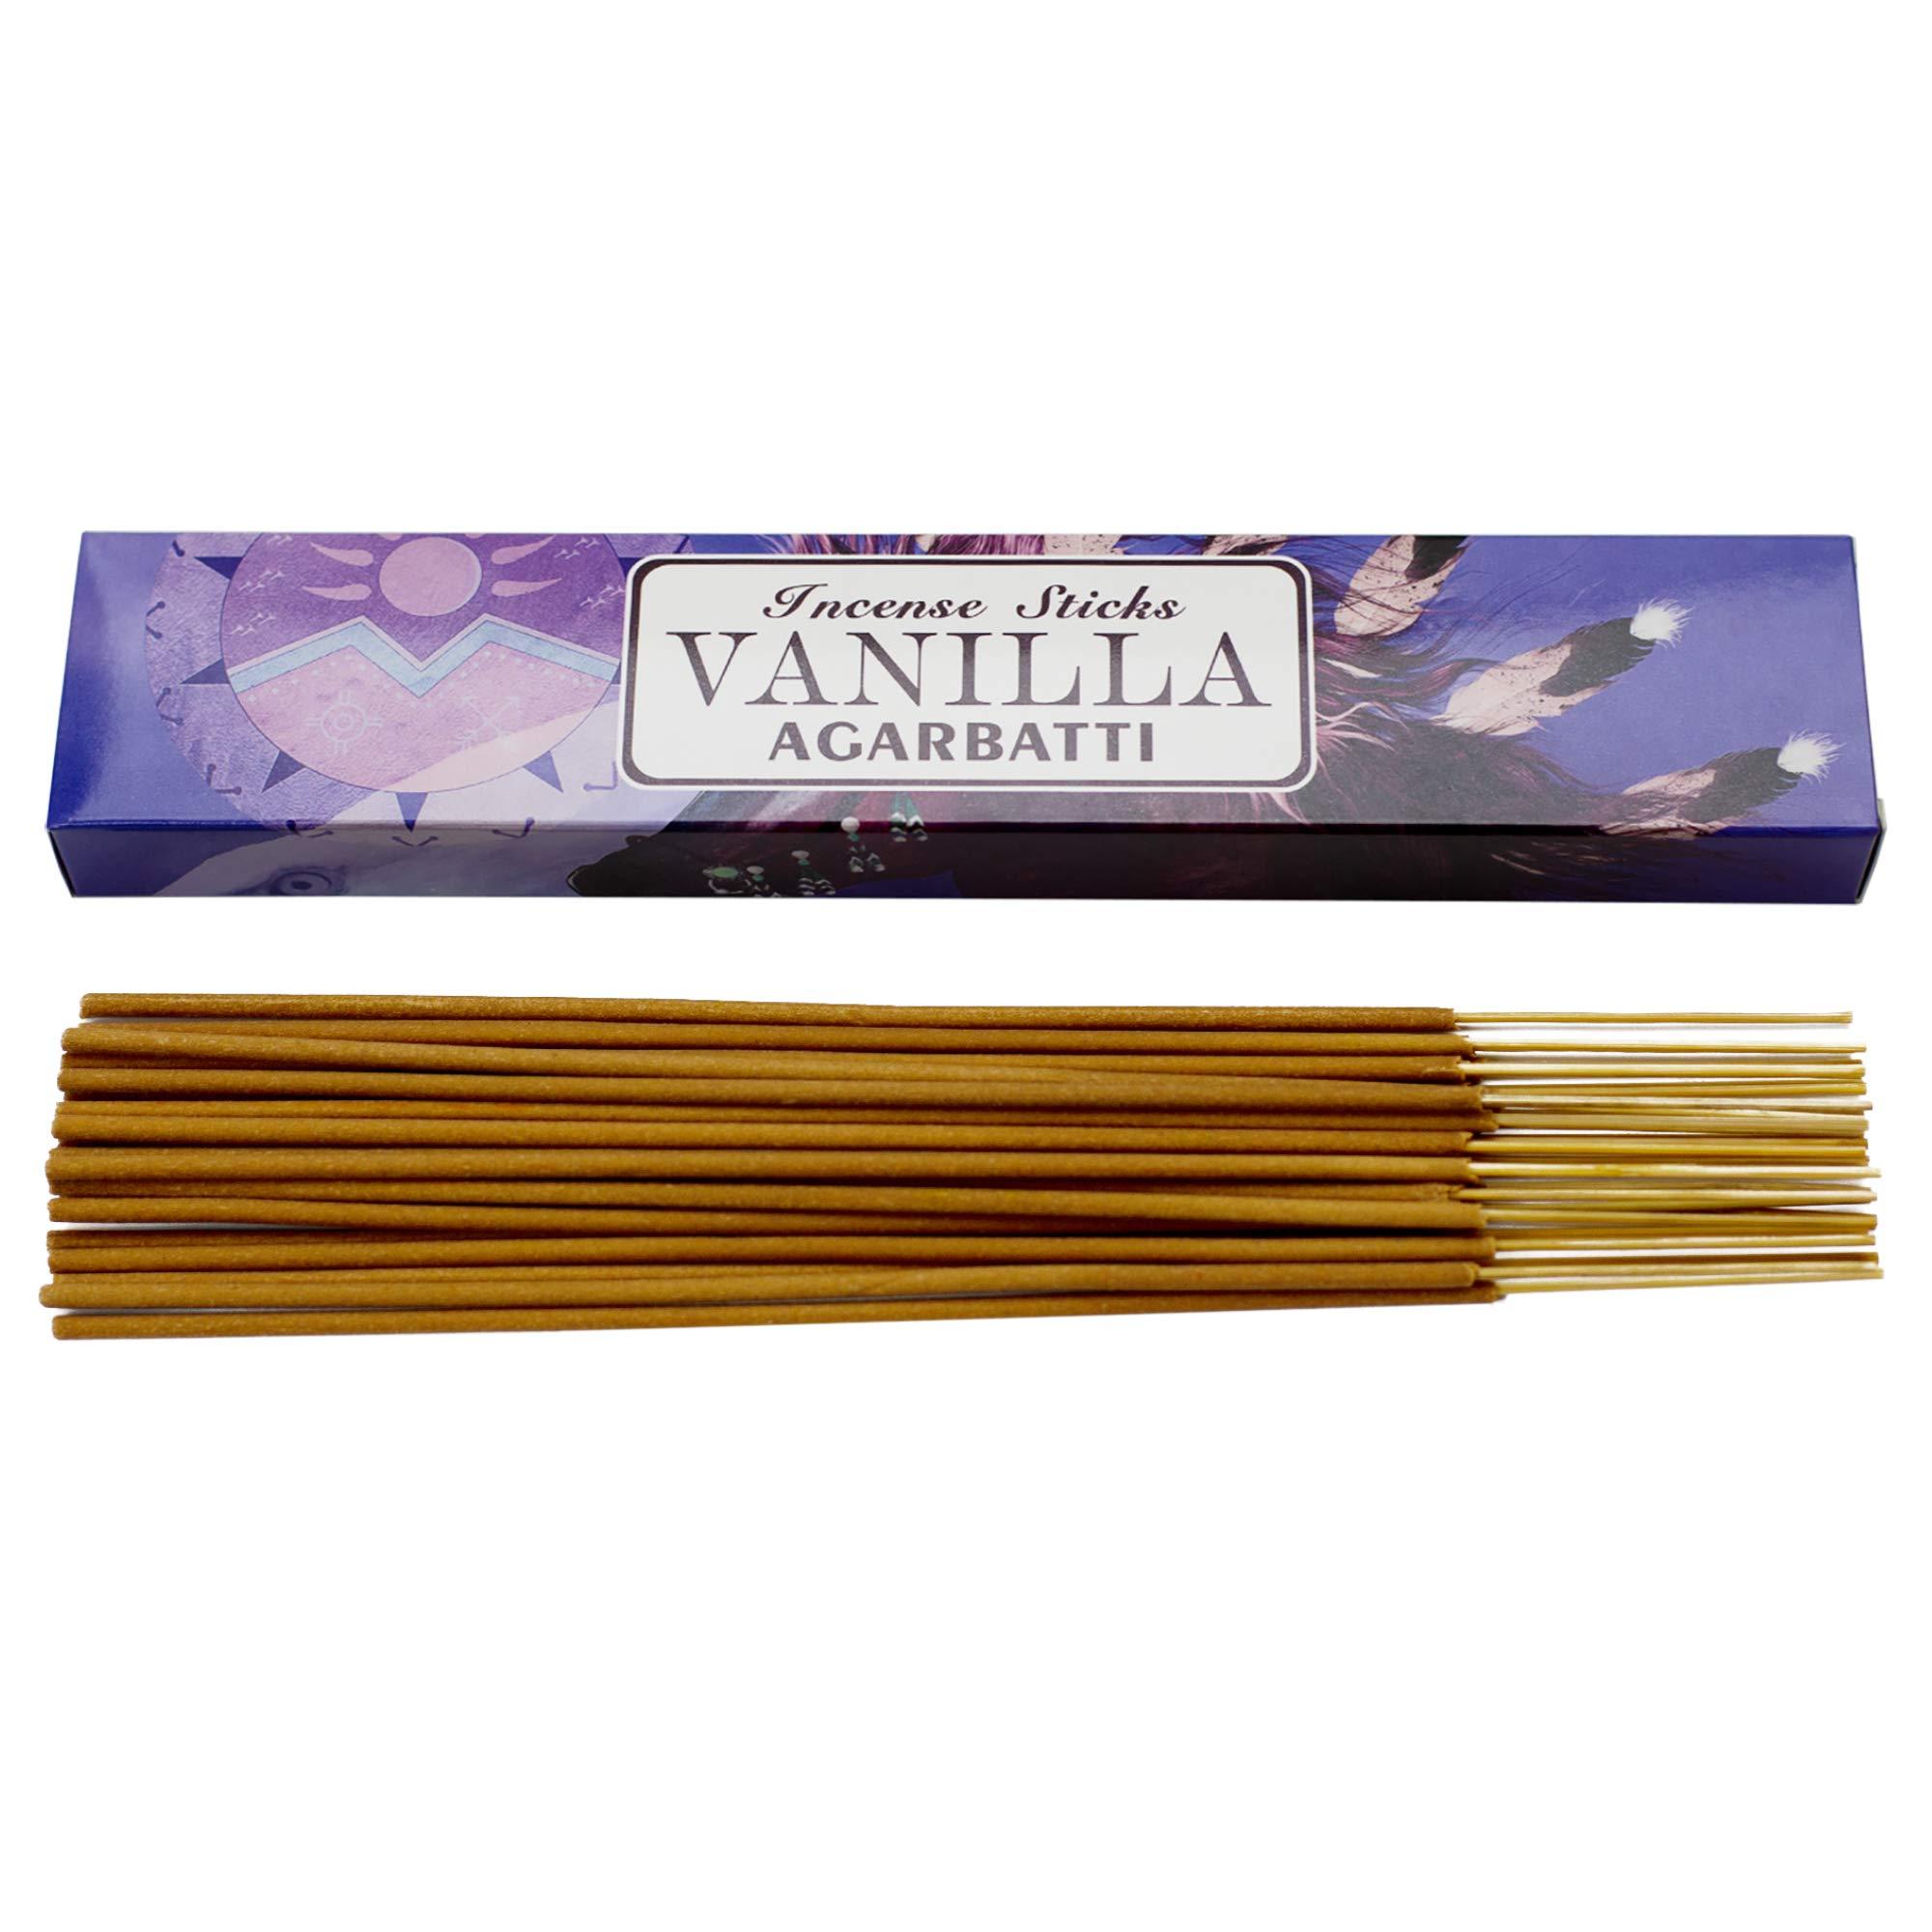 Mosfantal Premium Hand Dipped Incense Sticks - Lemon, Jasmine, Lavender, Vanilla, Apple, Variety Gift Pack (240Gram) by Mosfantal (Image #5)